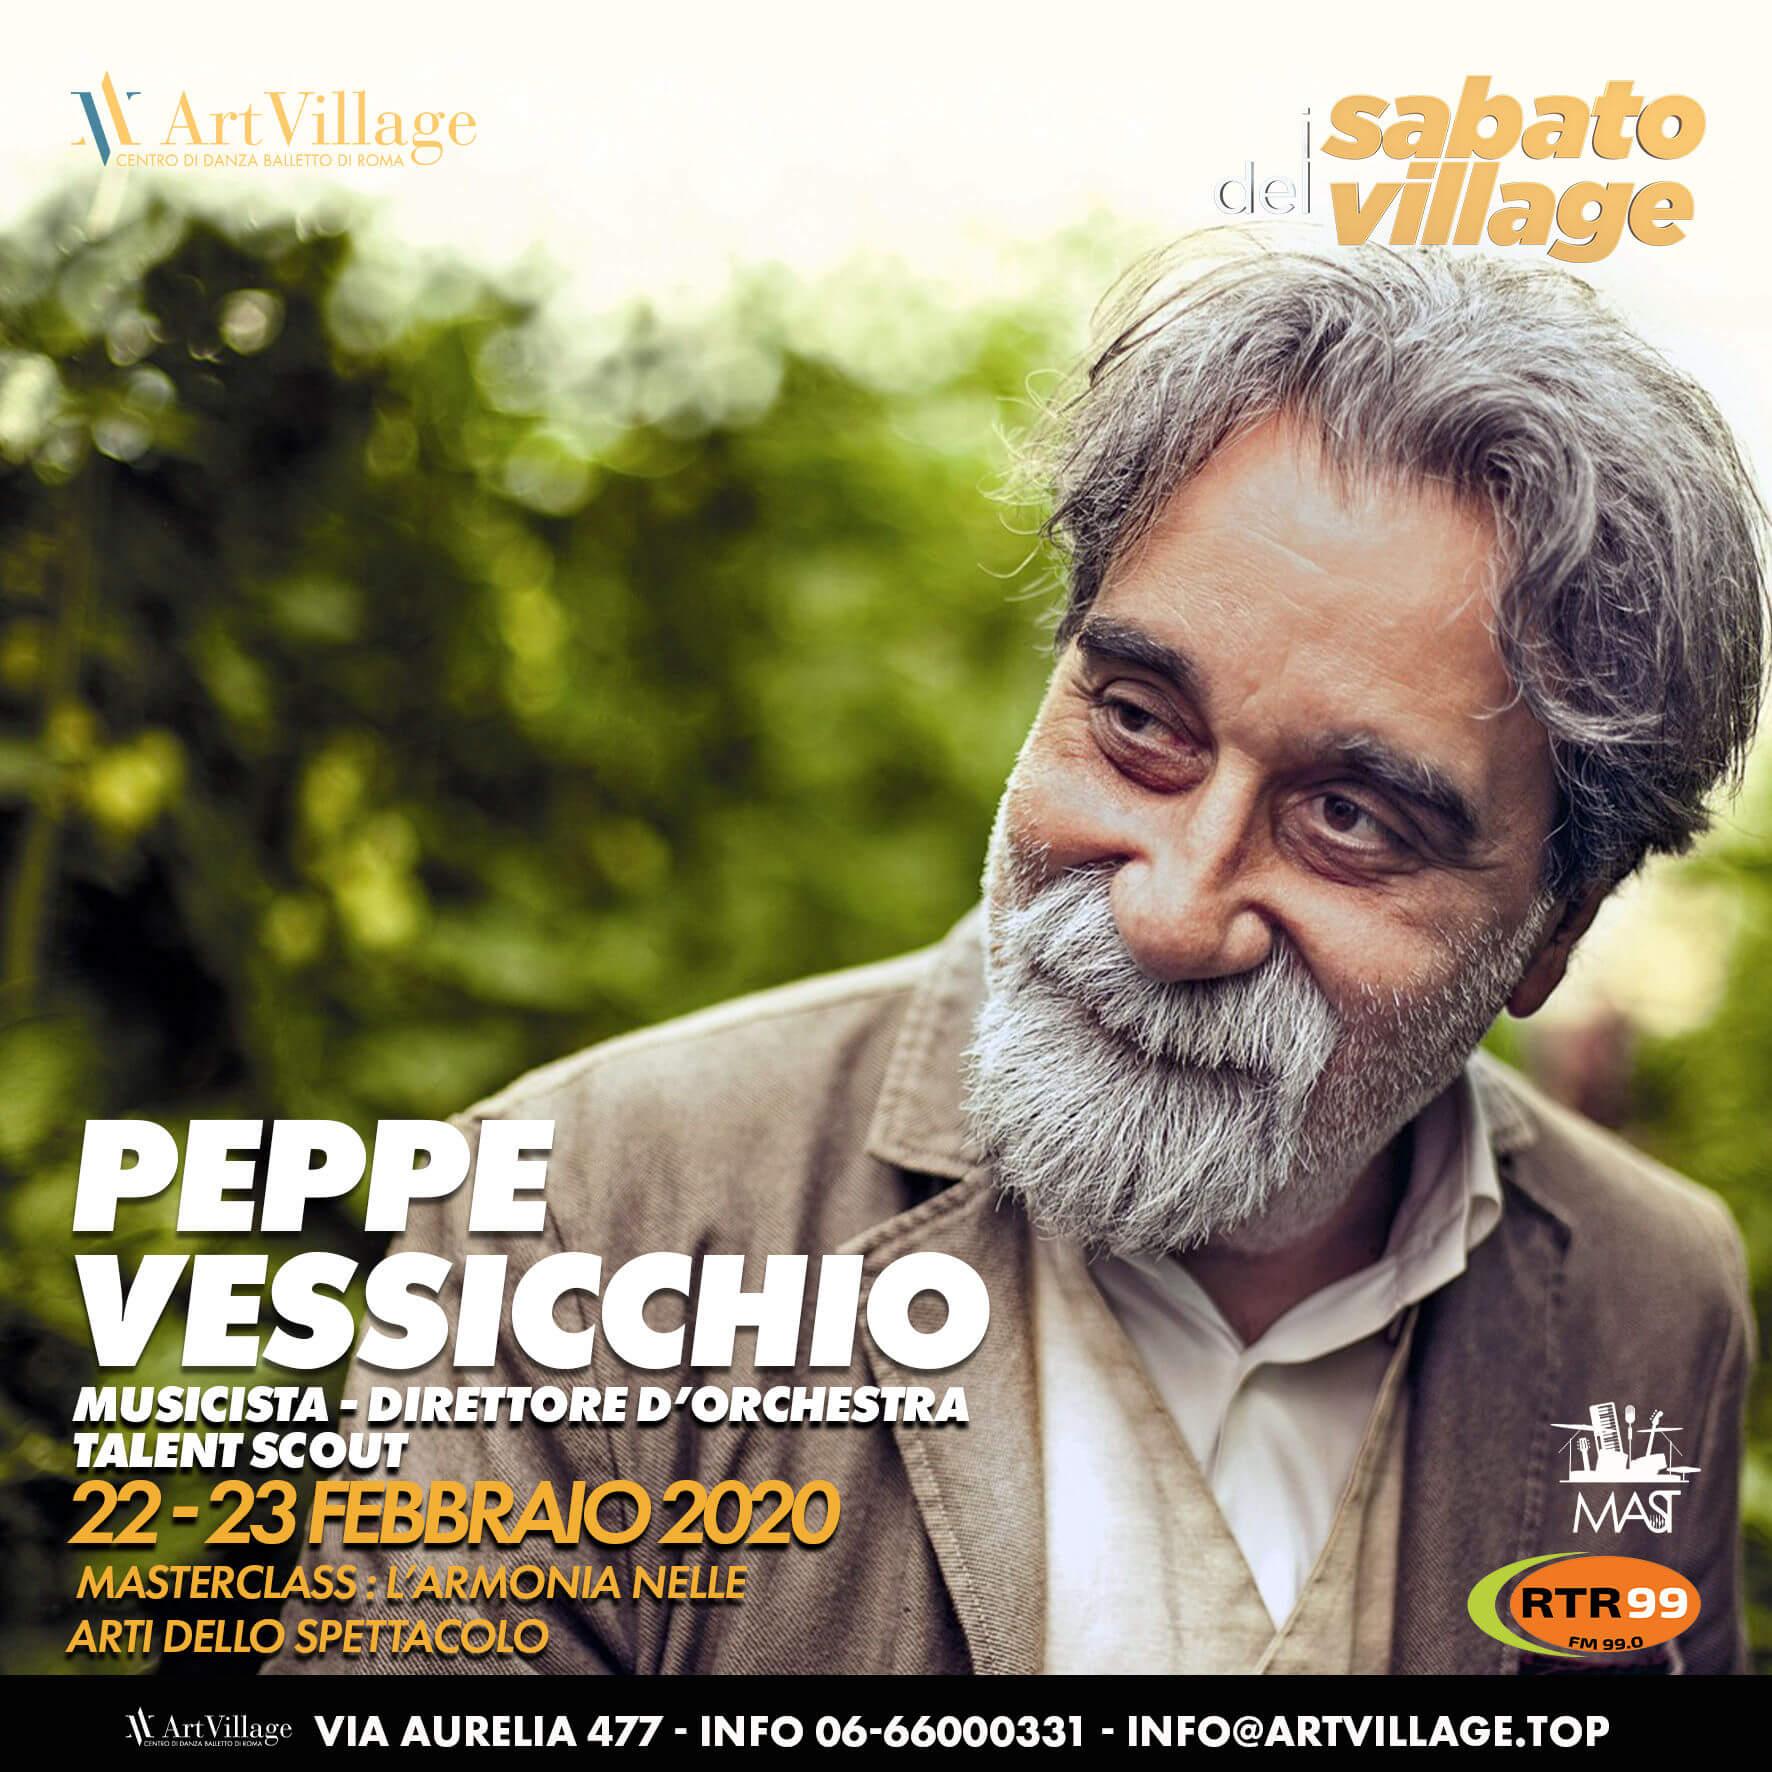 Peppe Vessicchio